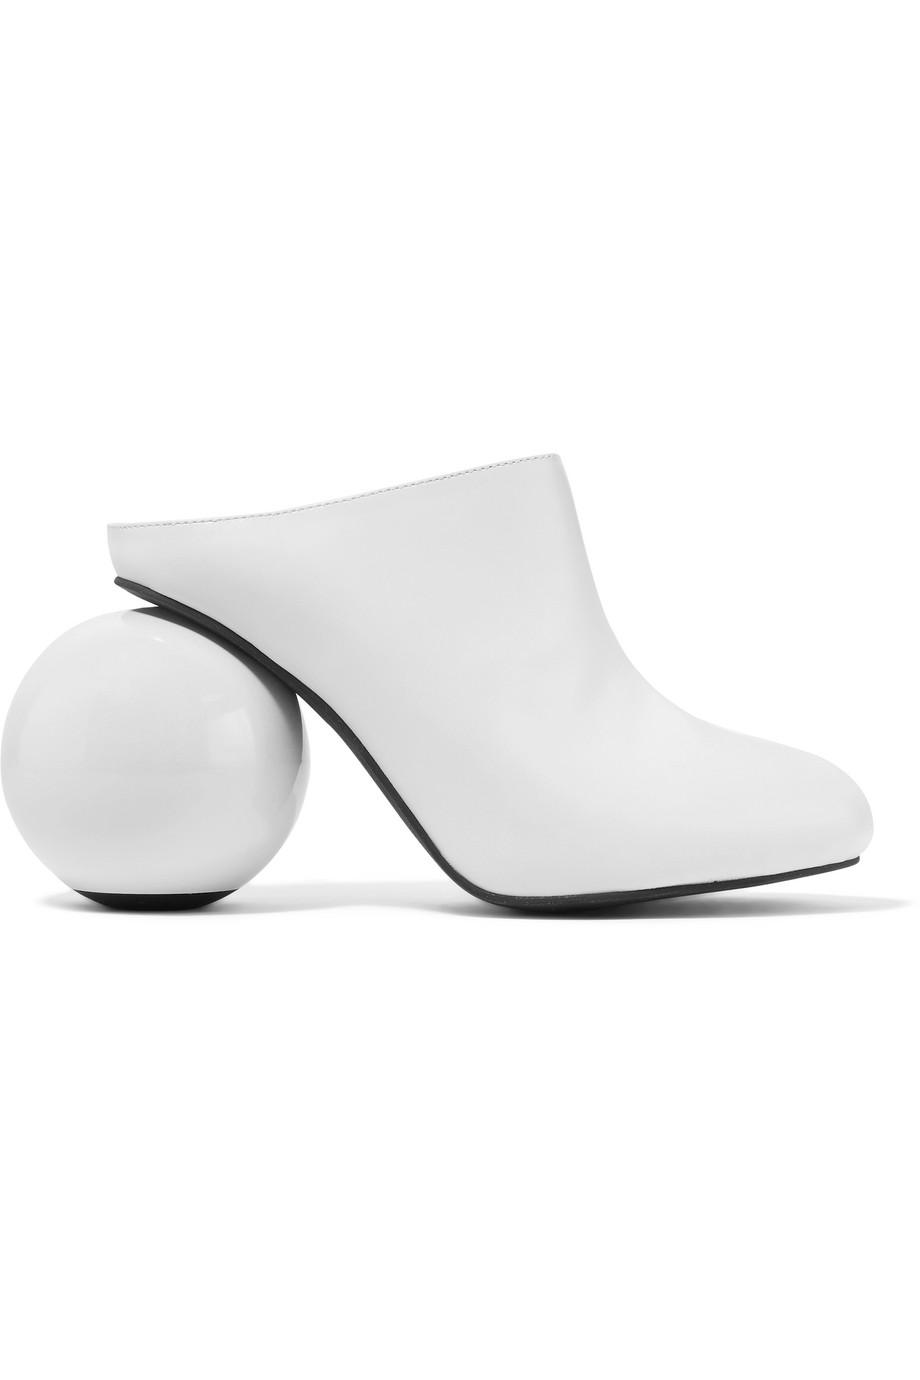 20 Model Sepatu Wanita Terbaru-media-10 - 103.8 FM Brava Radio 690ccf257f